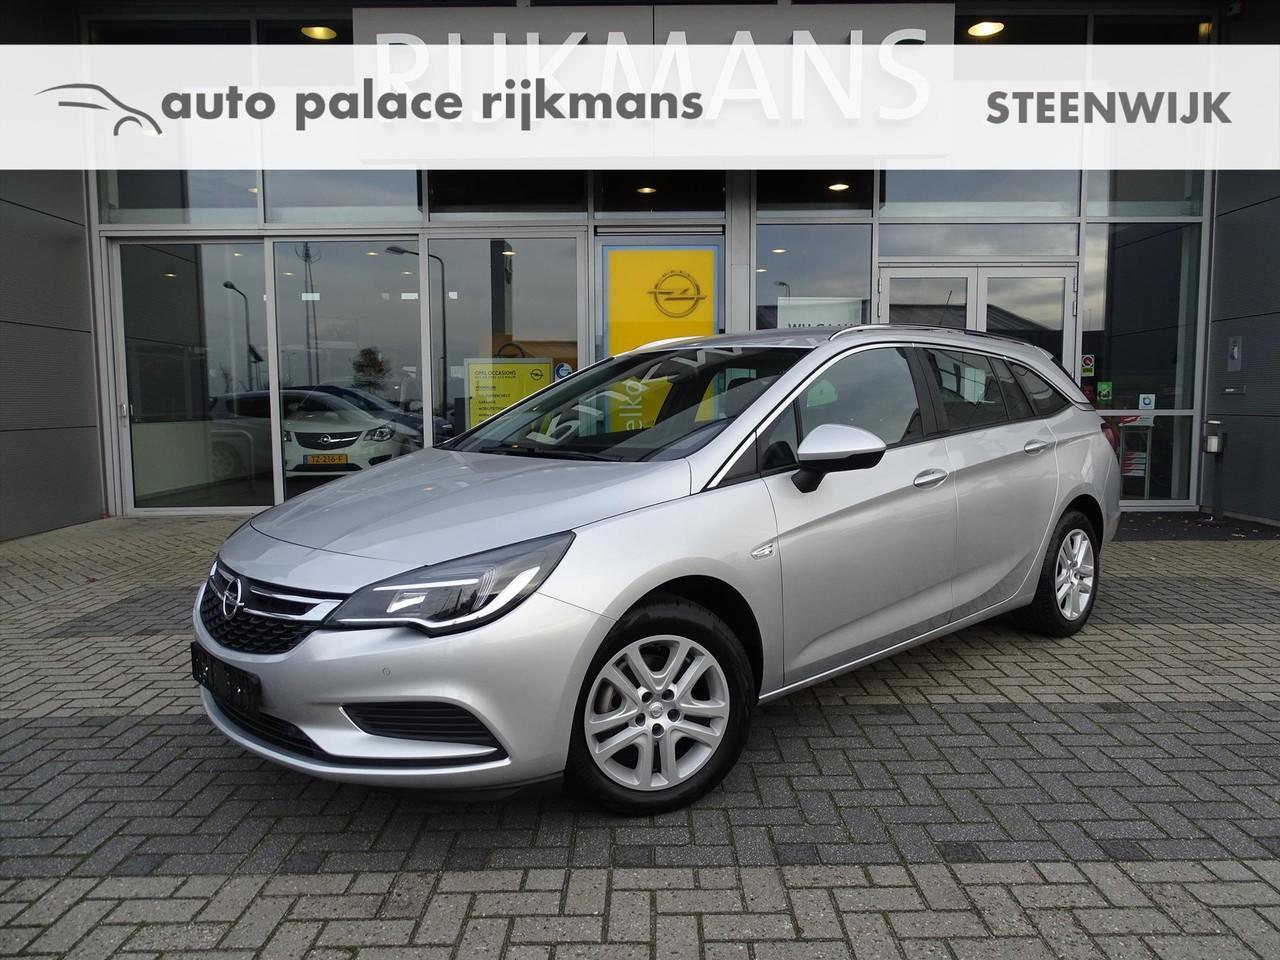 Opel Astra Sports tourer business+ 1.0t 105 pk - comfortpack - navi - agr - reservewiel